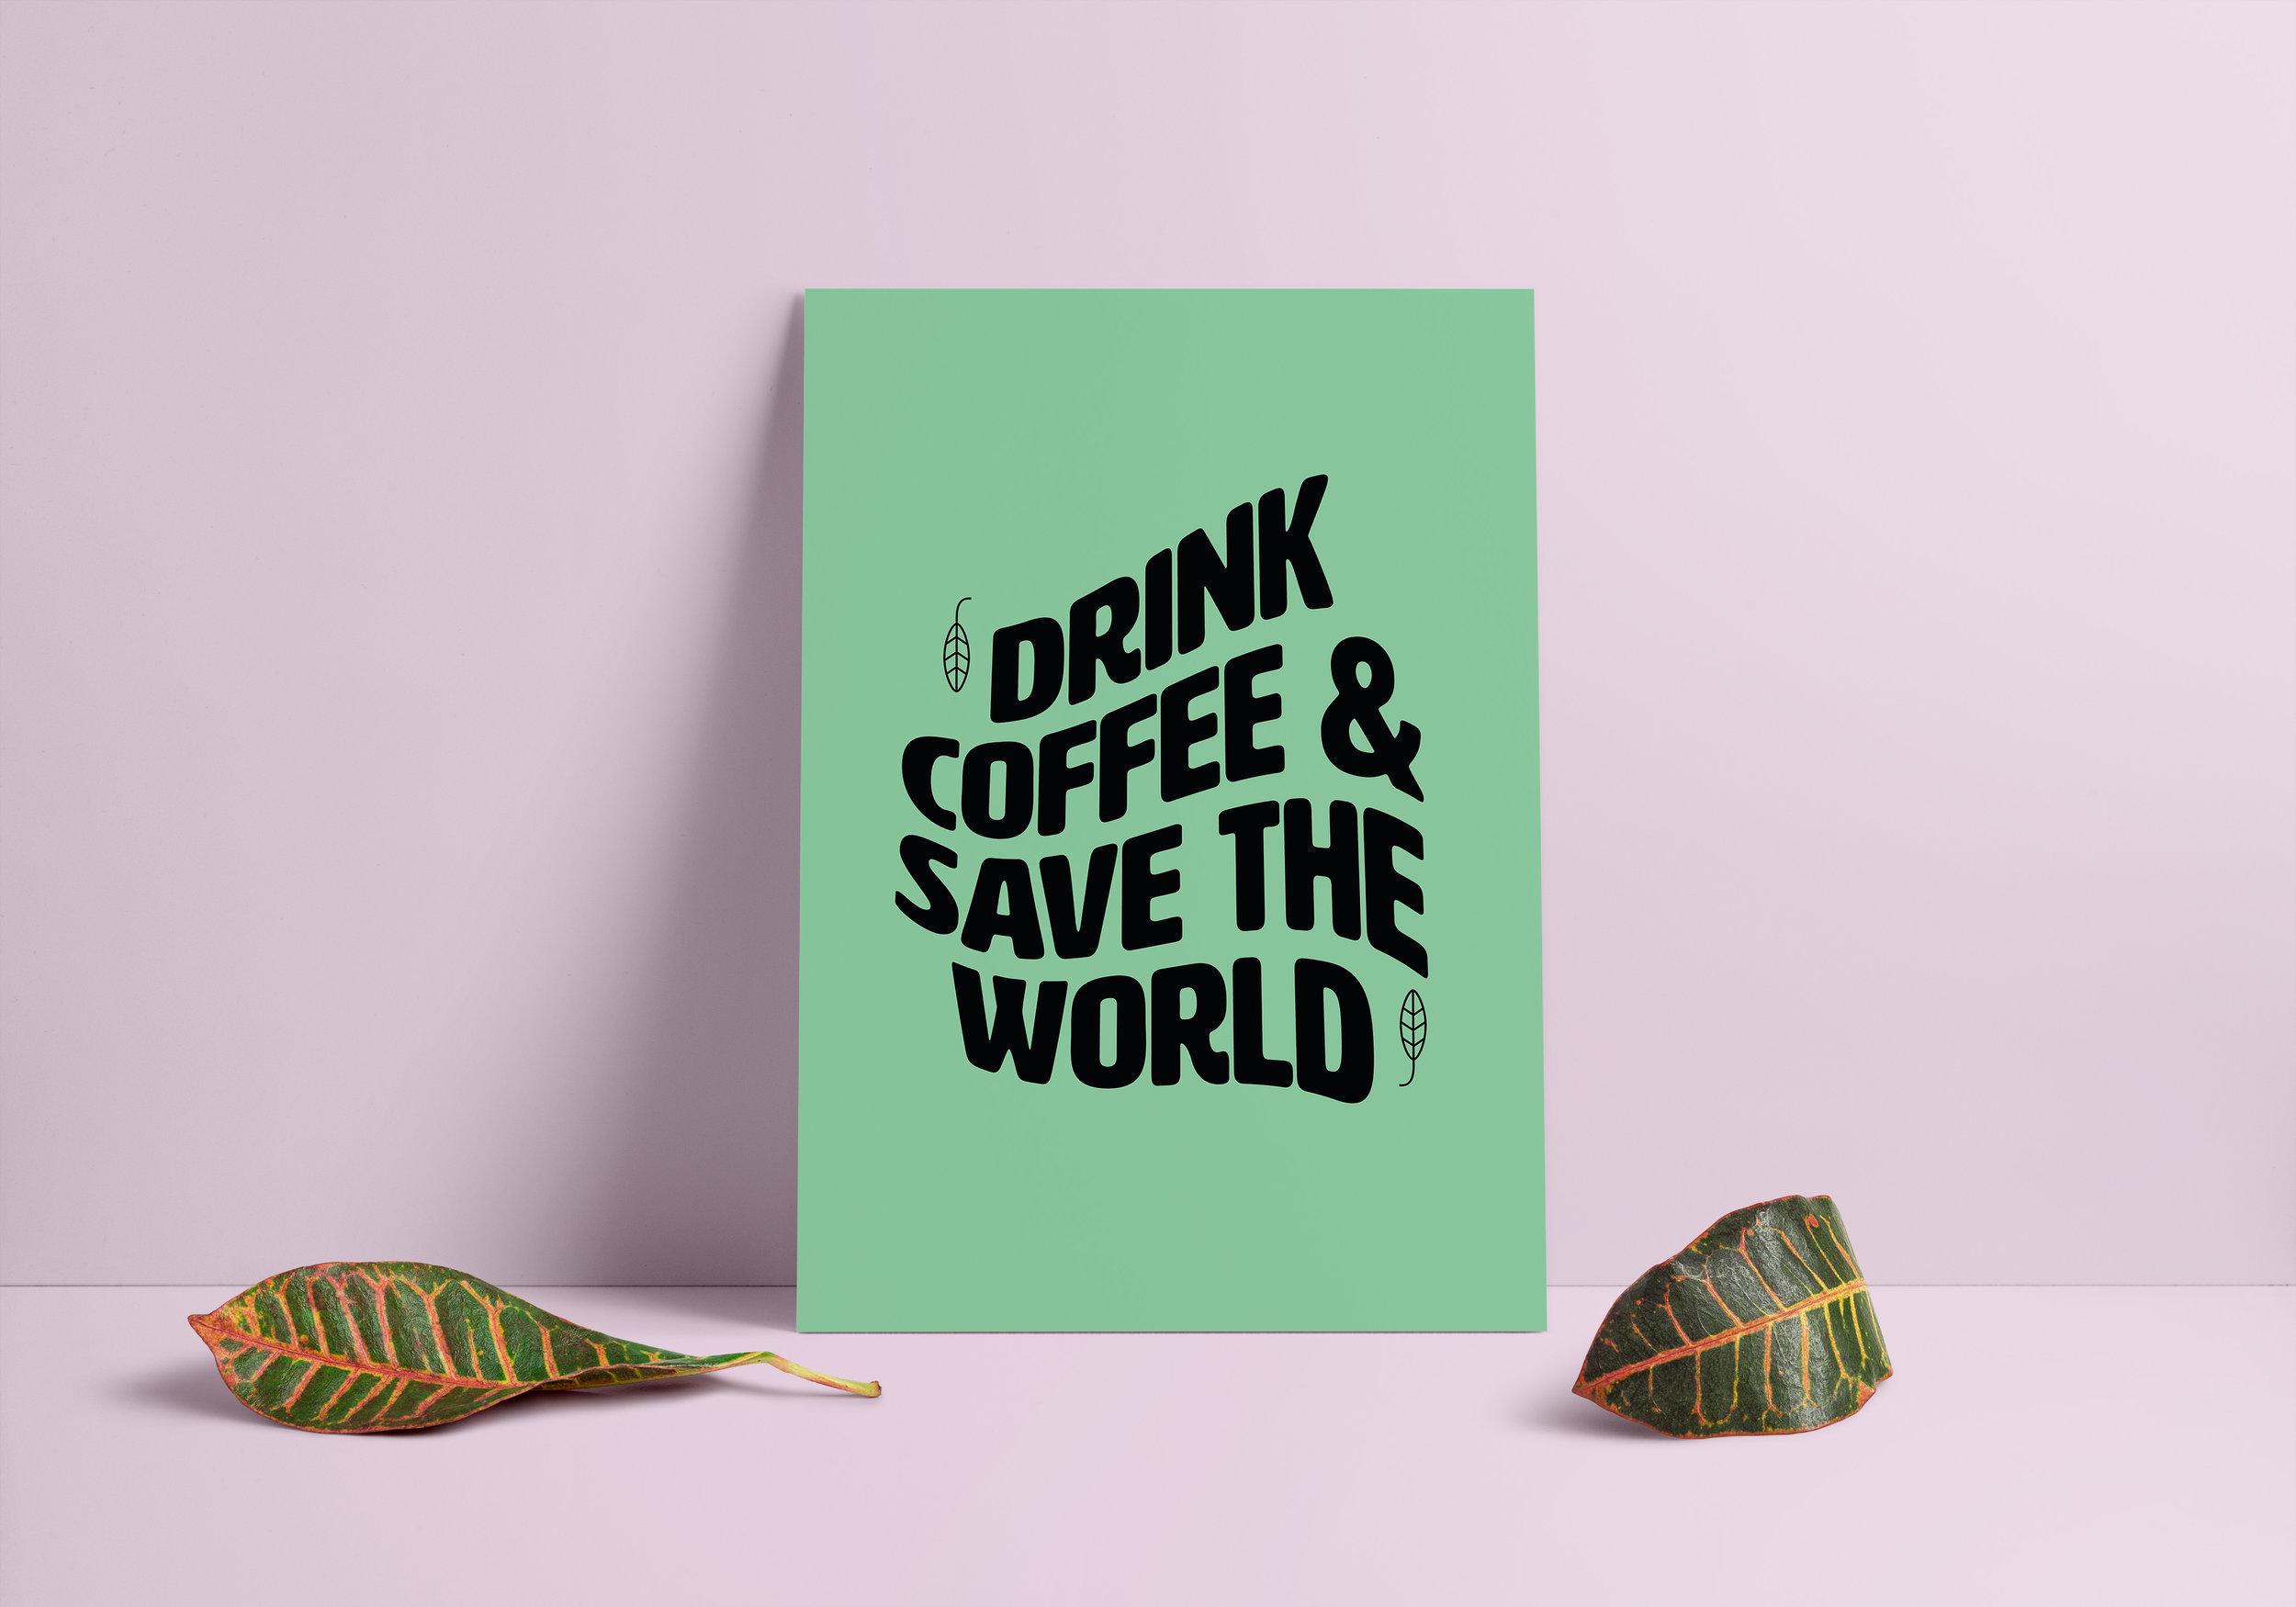 drinkcoffee.jpg